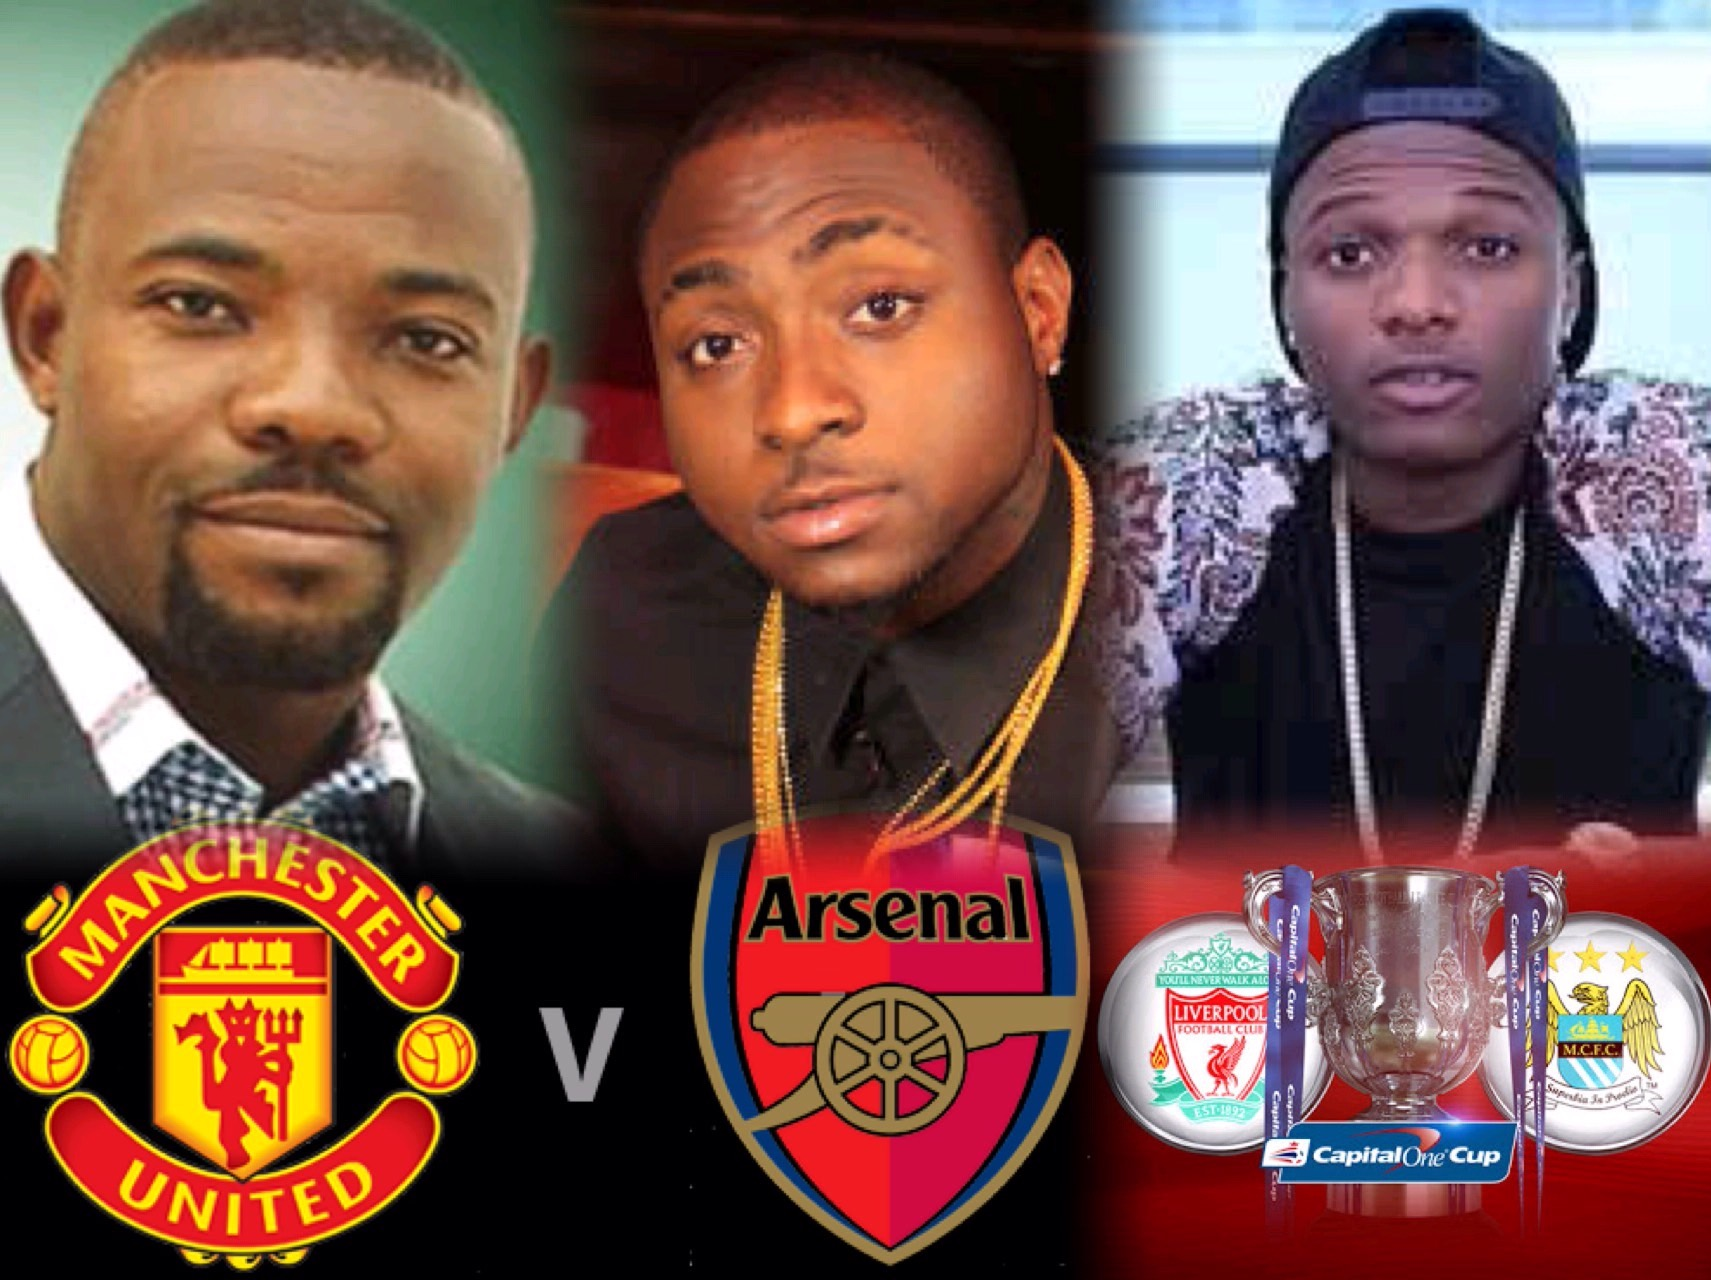 Okey Bakassi Backs Arsenal Against United, Davido In Dilemma; Wizkid Roots For Liverpool